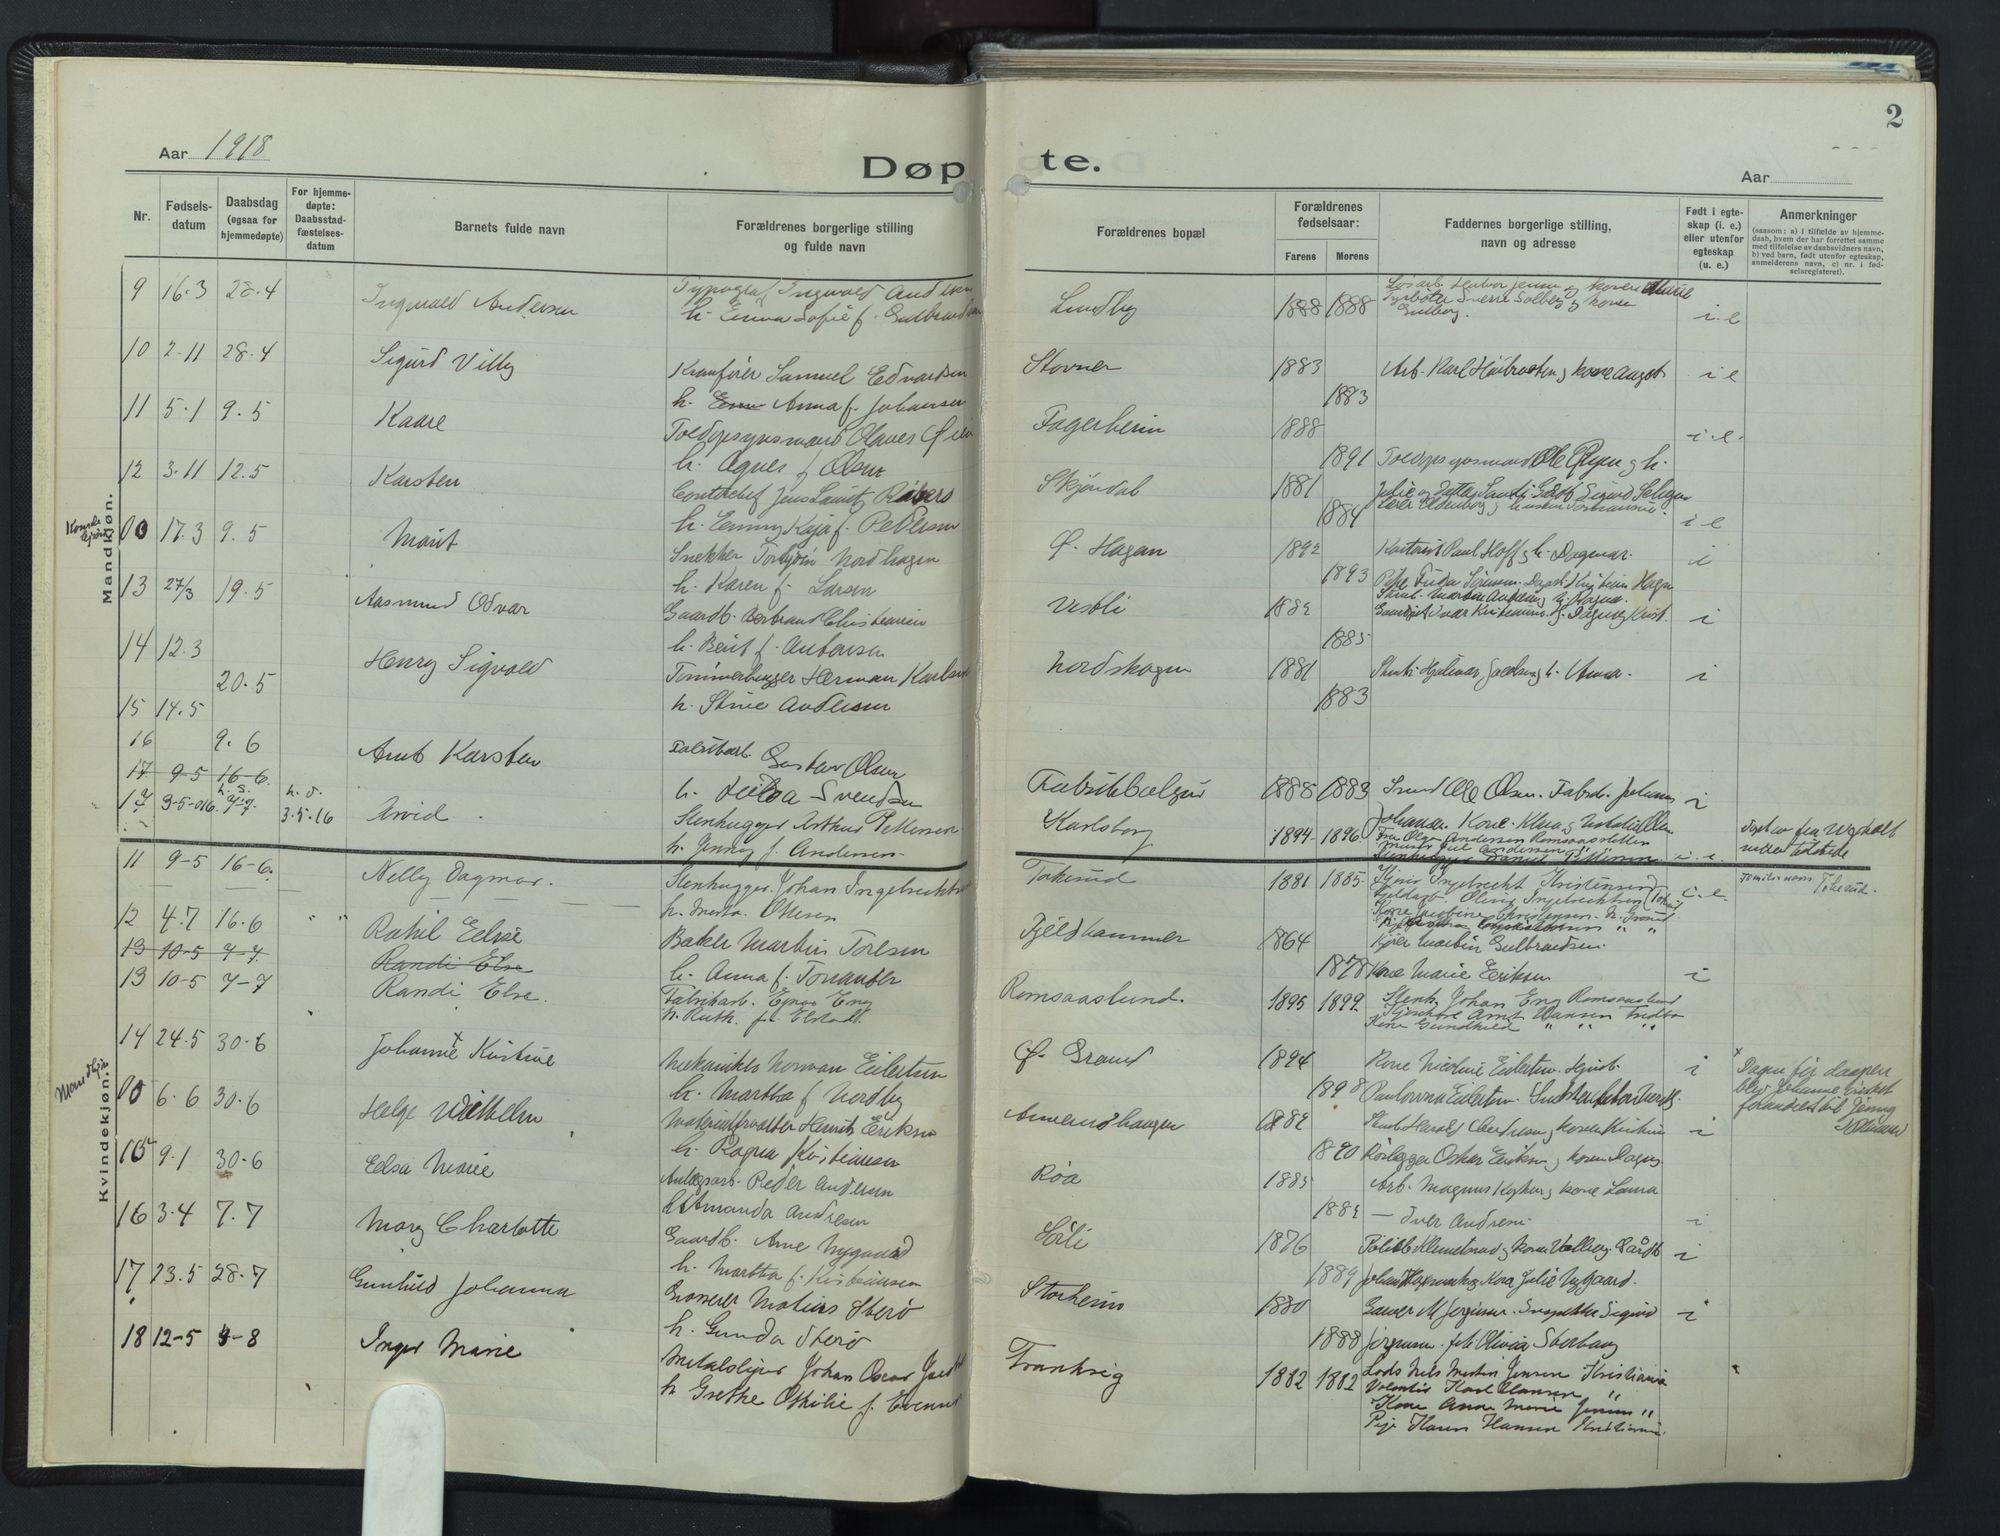 SAO, Østre Aker prestekontor Kirkebøker, F/Fb/L0002: Ministerialbok nr. II 2, 1918-1930, s. 2